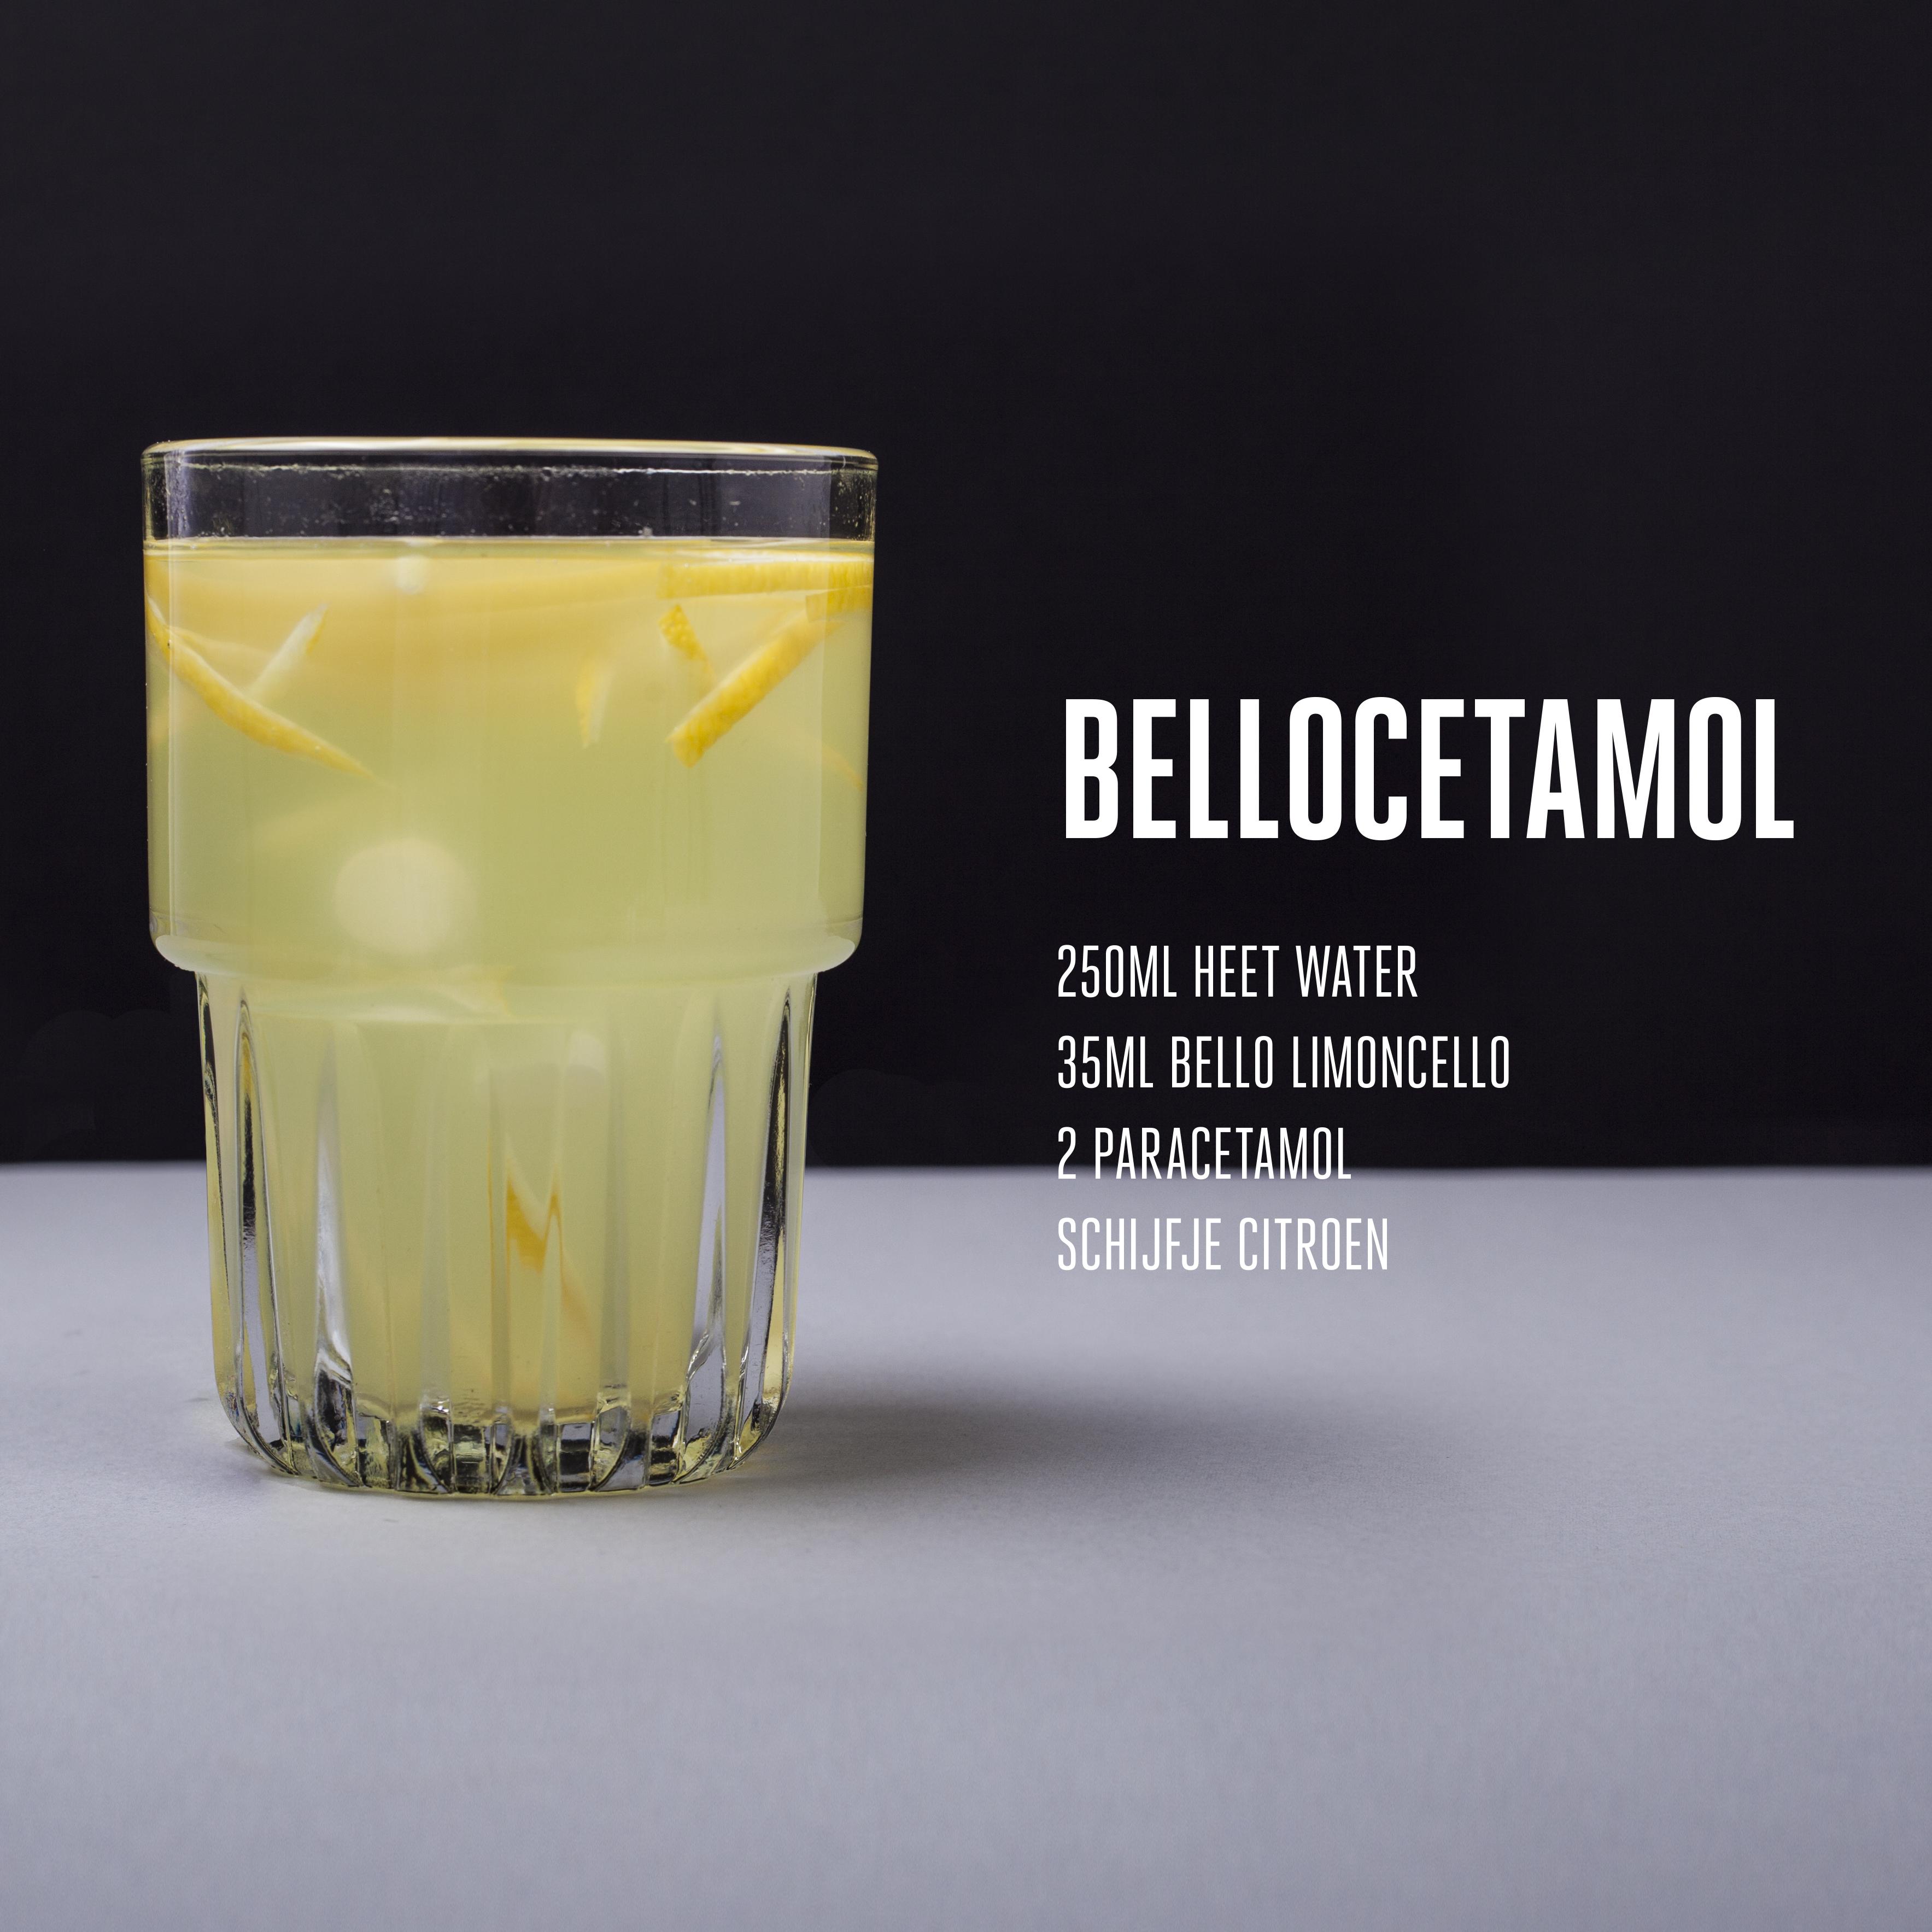 BELLOCETAMOL